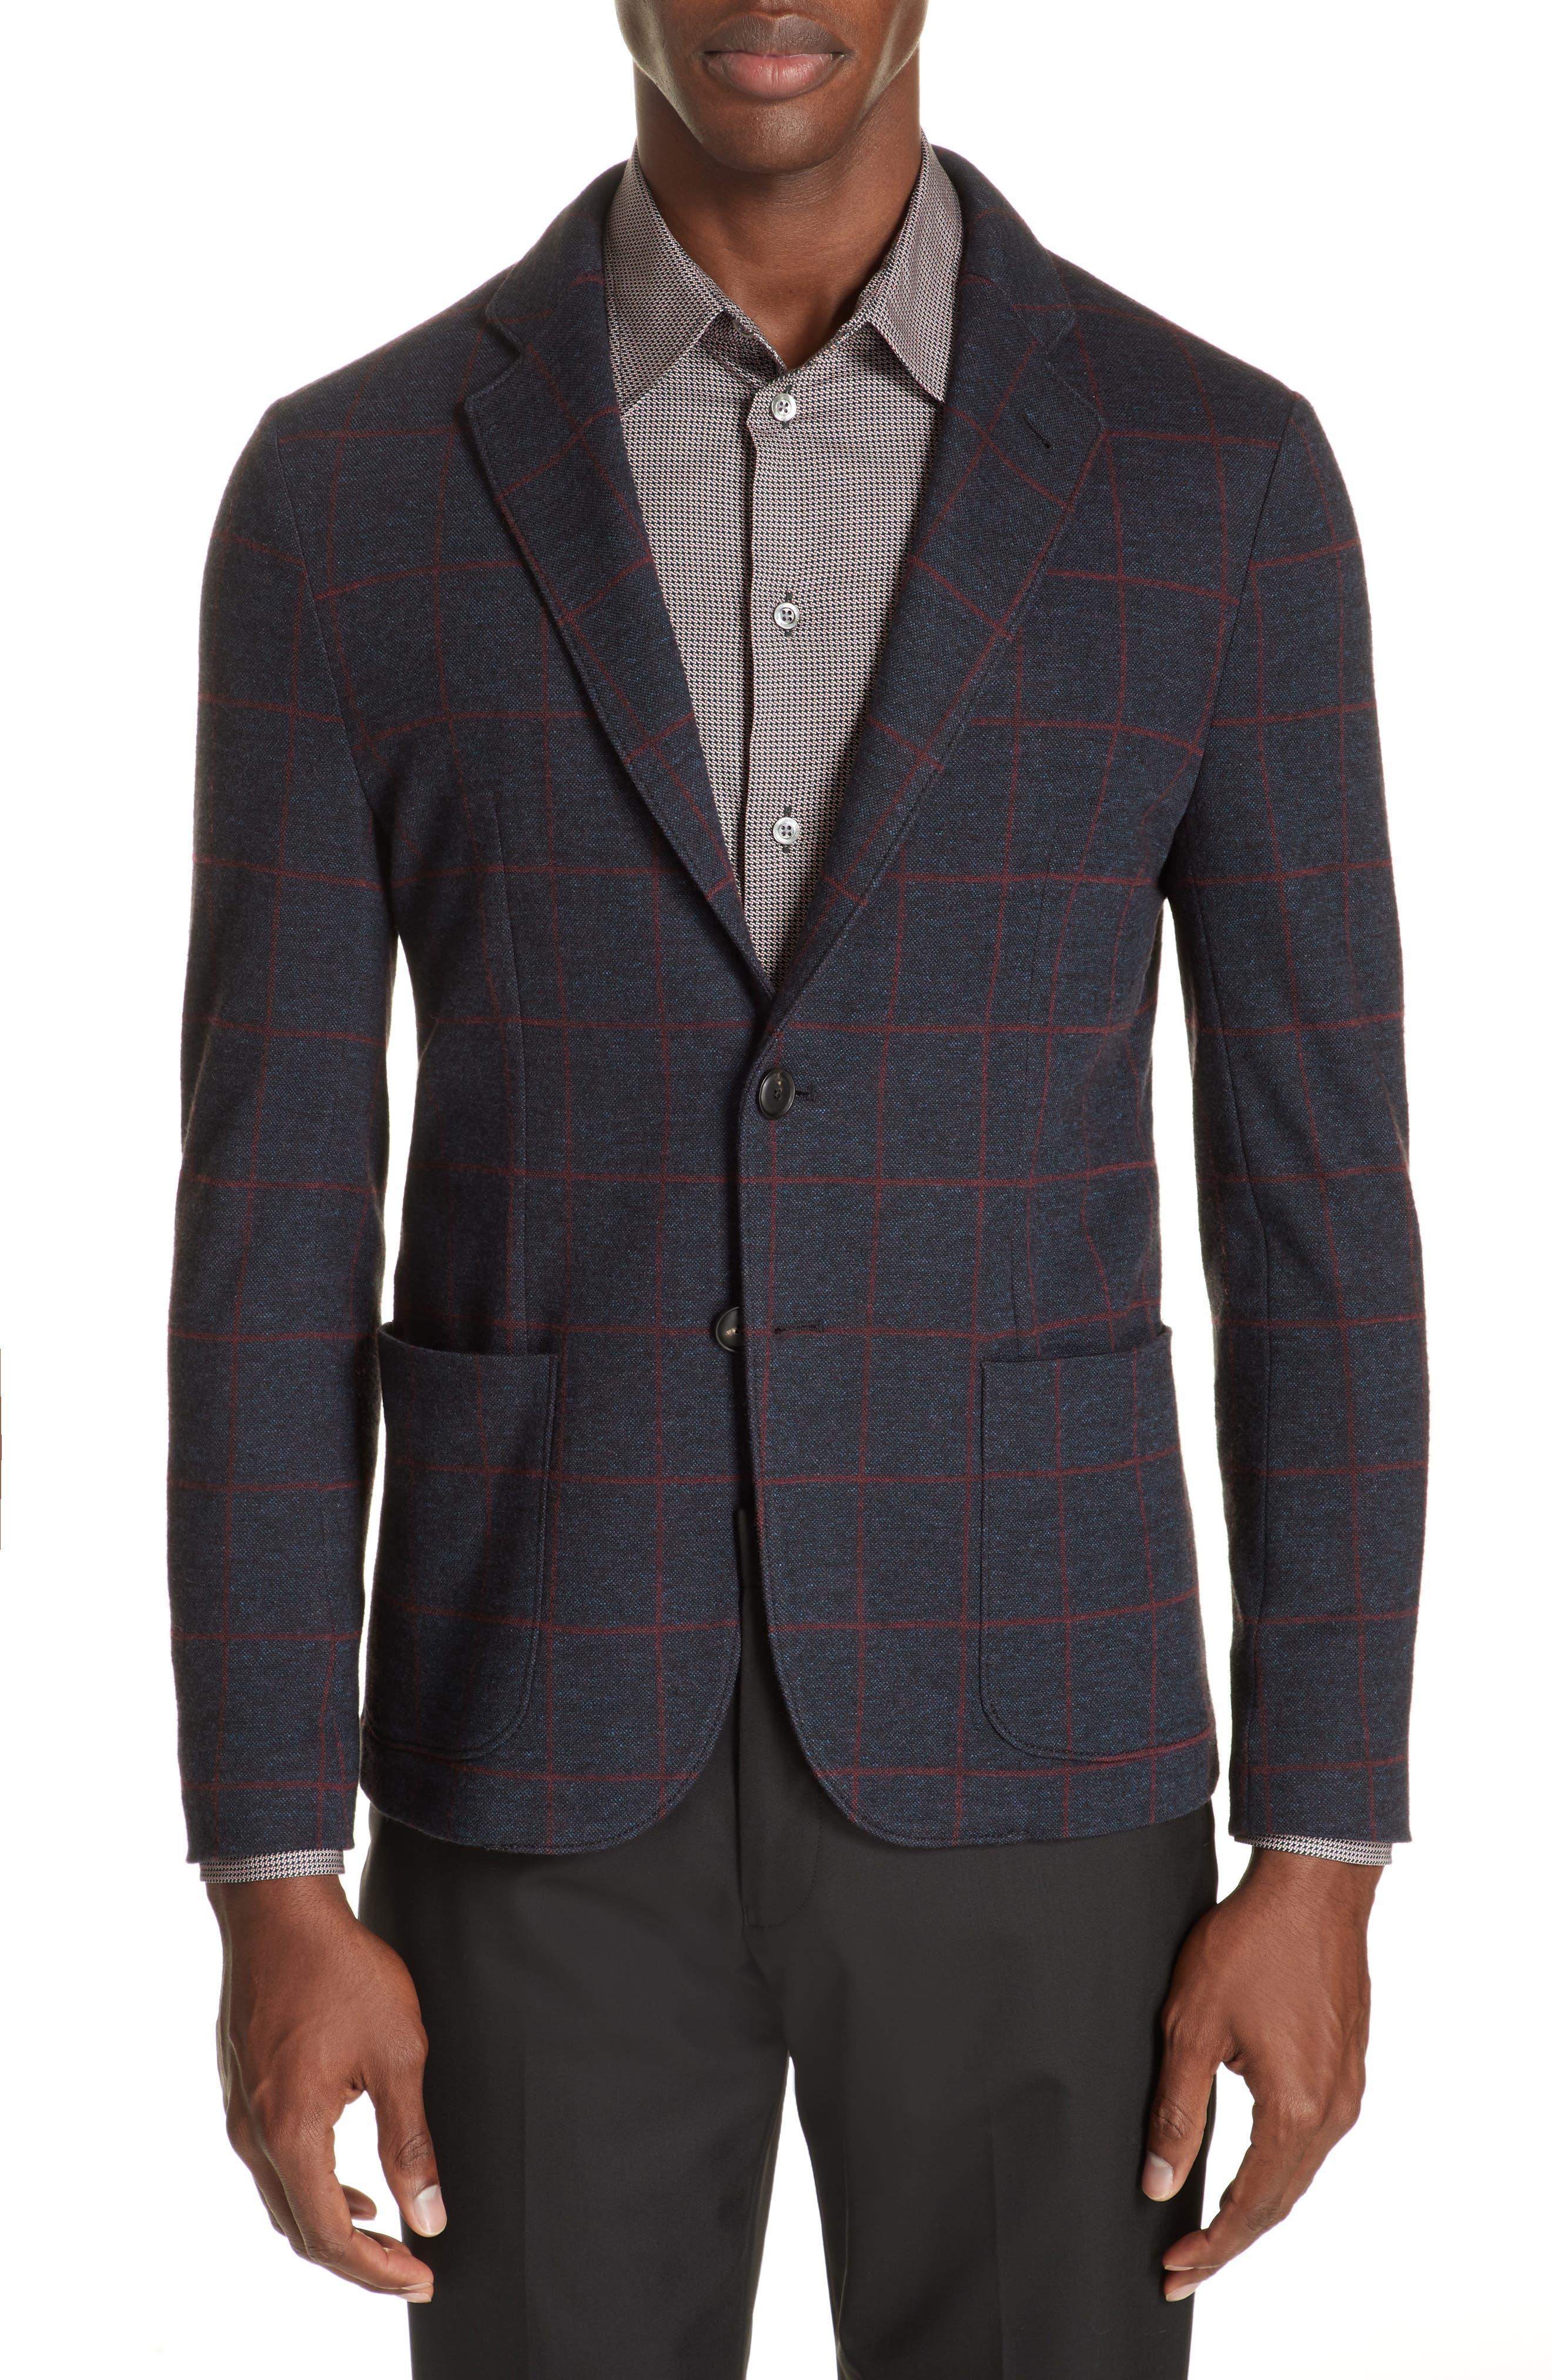 EMPORIO ARMANI Men'S Windowpane Jacquard Soft Blazer Jacket in Blue Multi